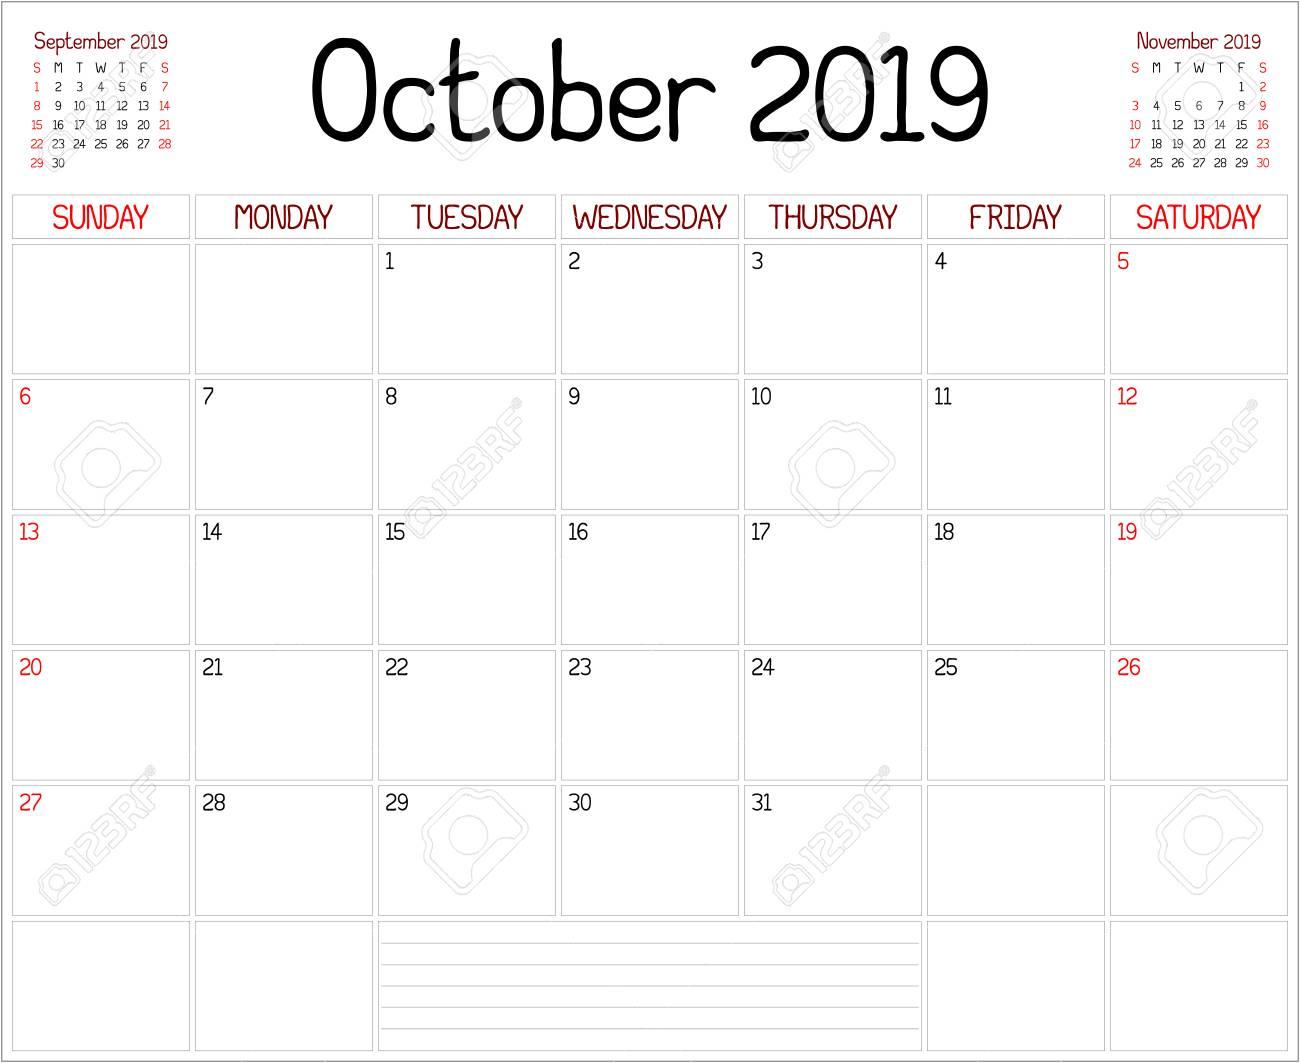 October Calendar 2019.Year 2019 October Planner A Monthly Planner Calendar For October